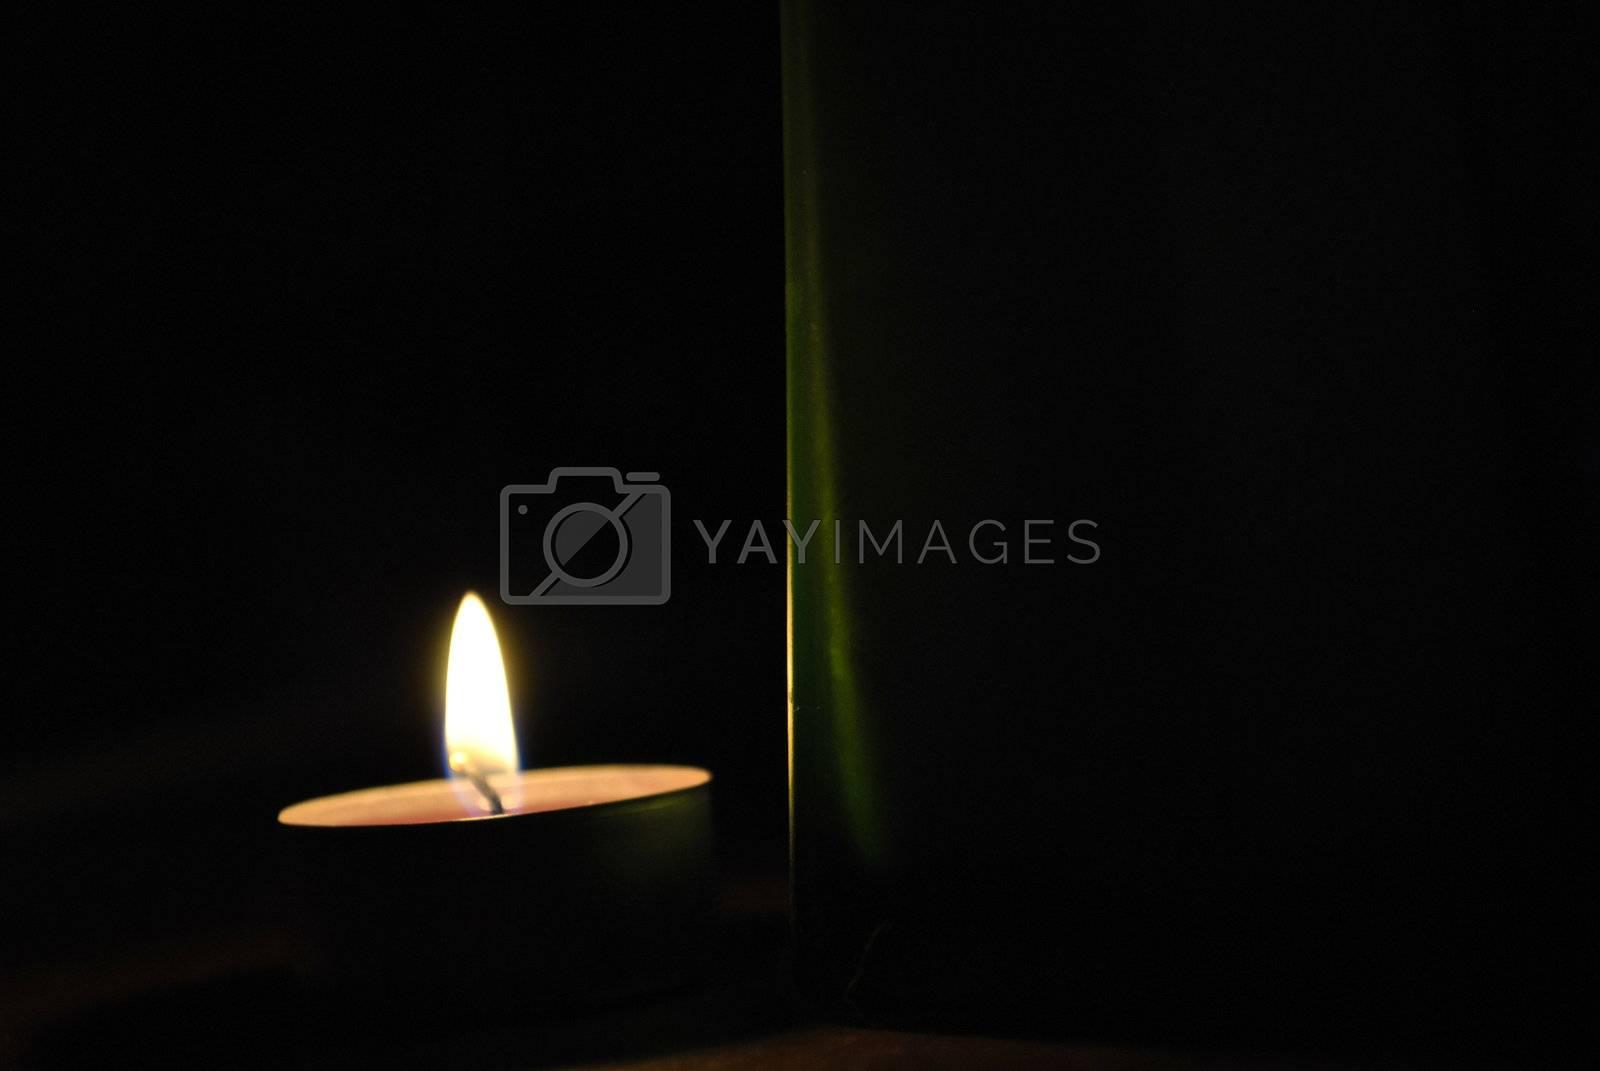 Burninging candle in the dark